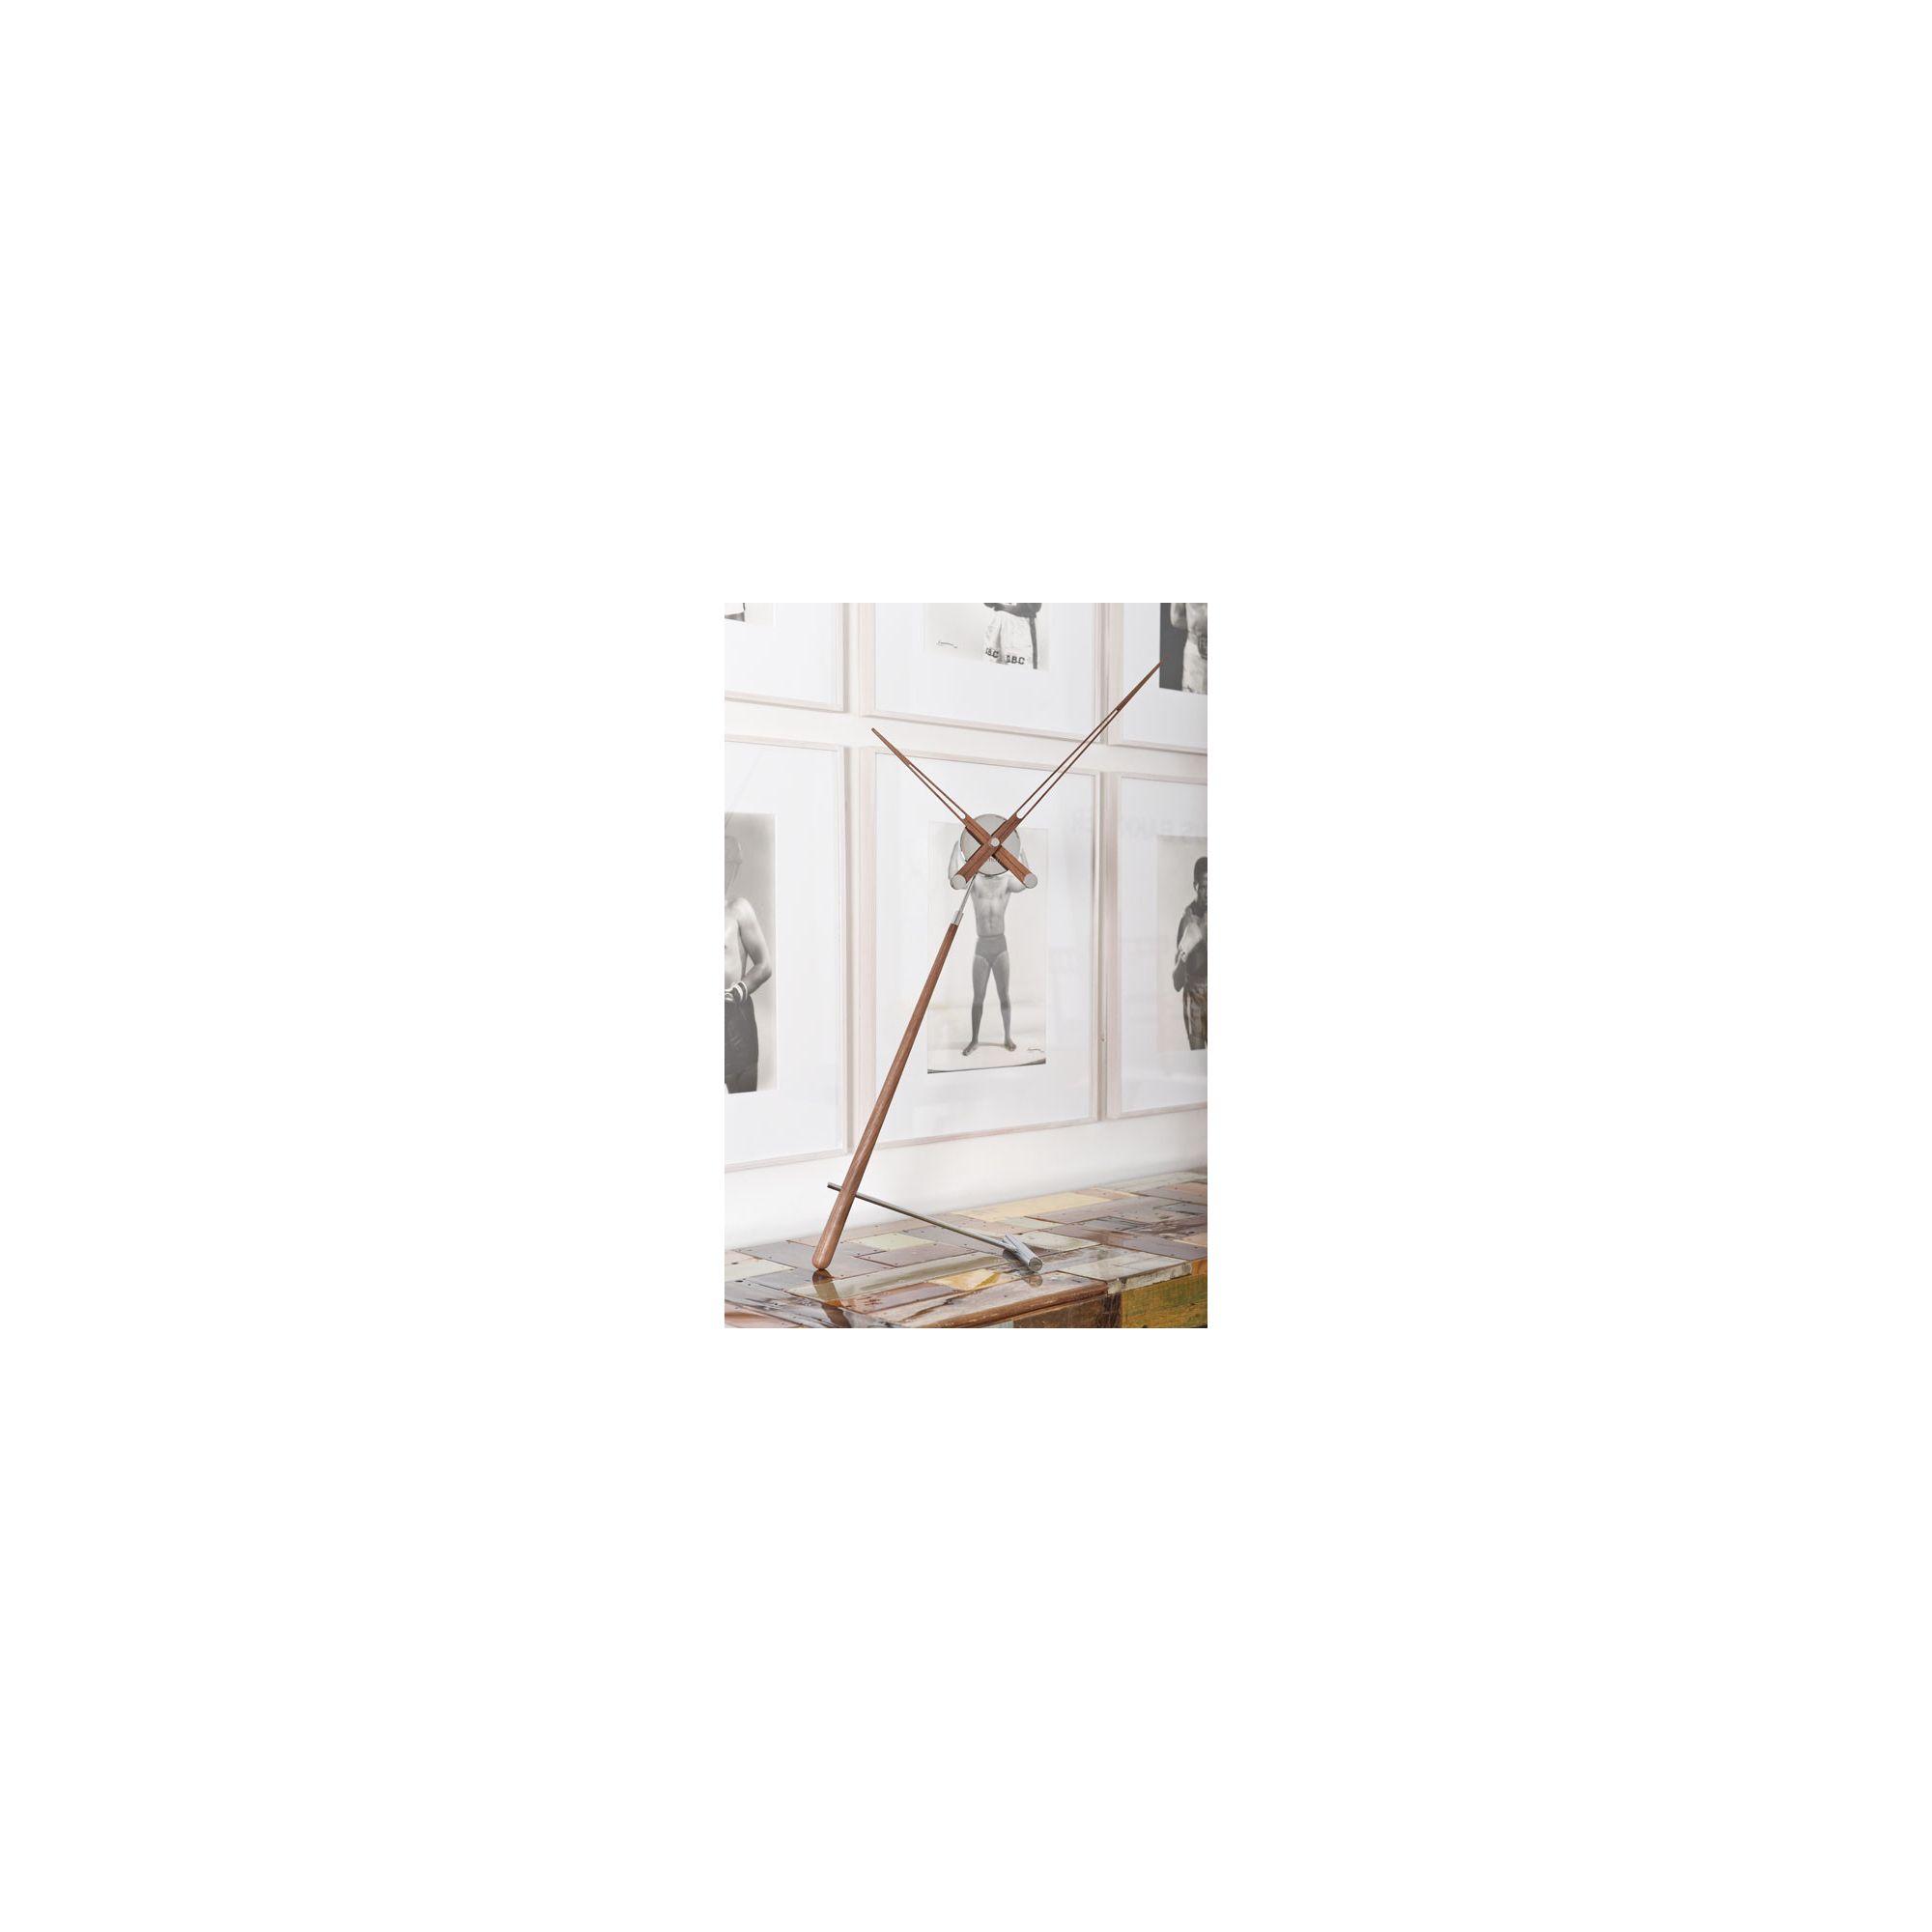 NOMON Puntero Clock - Natural Walnut at Tesco Direct